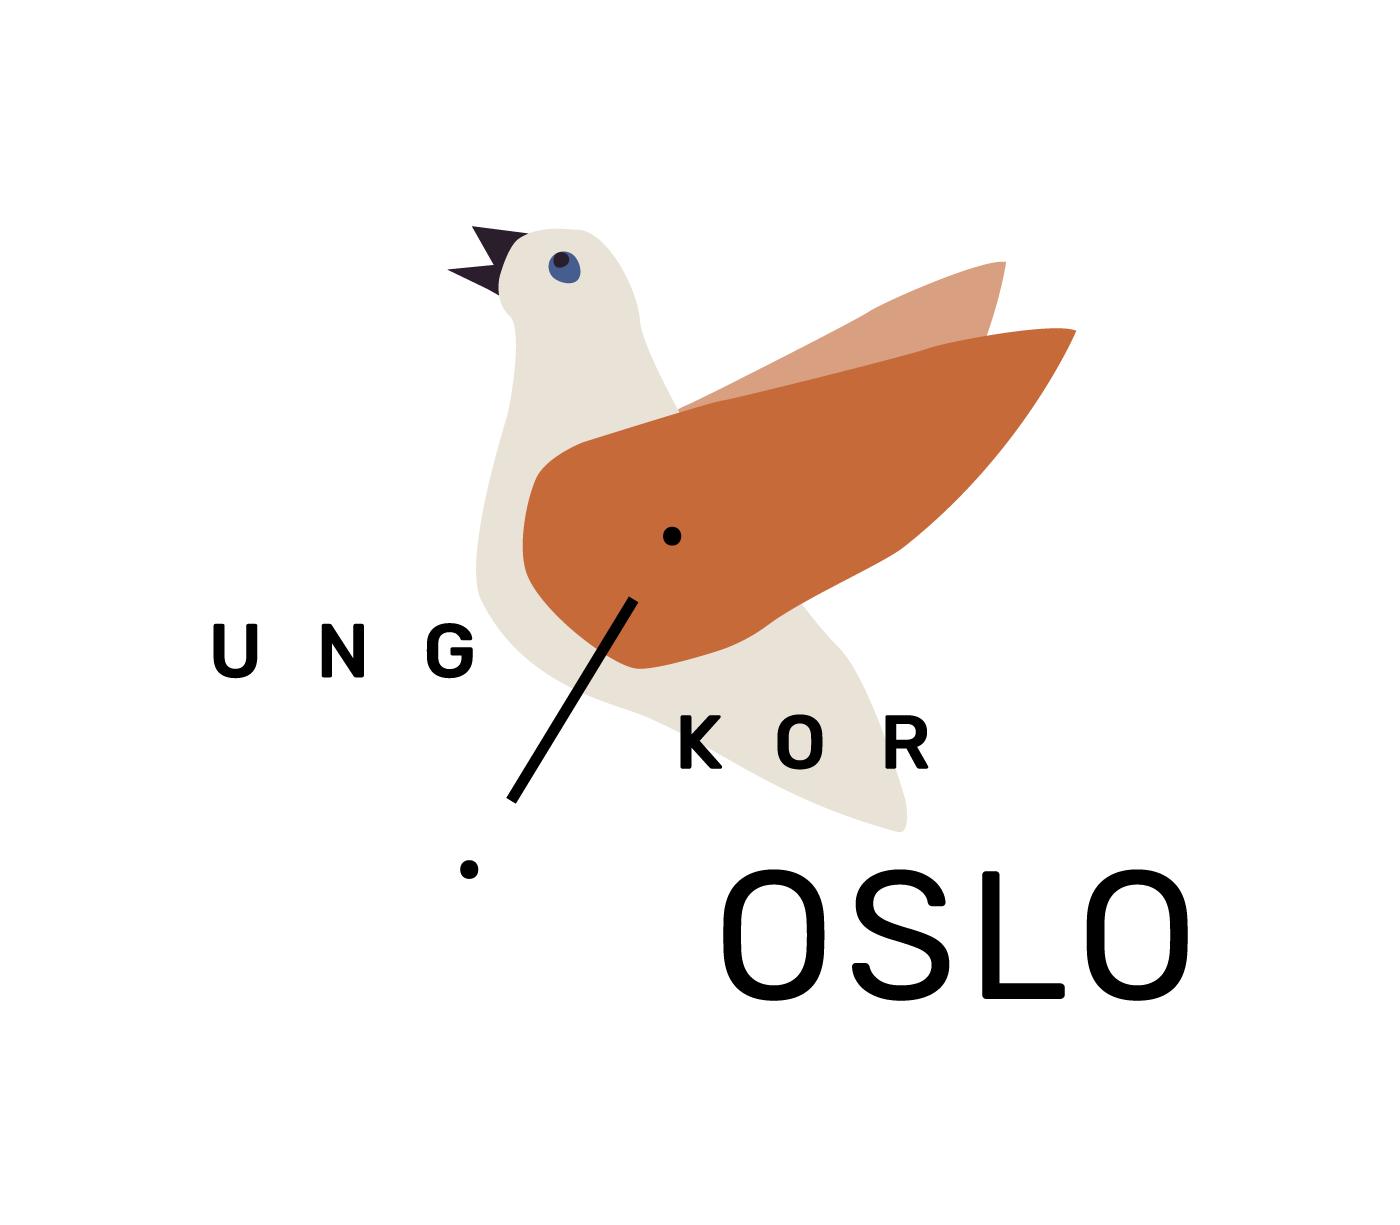 oslo-fugl-whitespace-1400.png